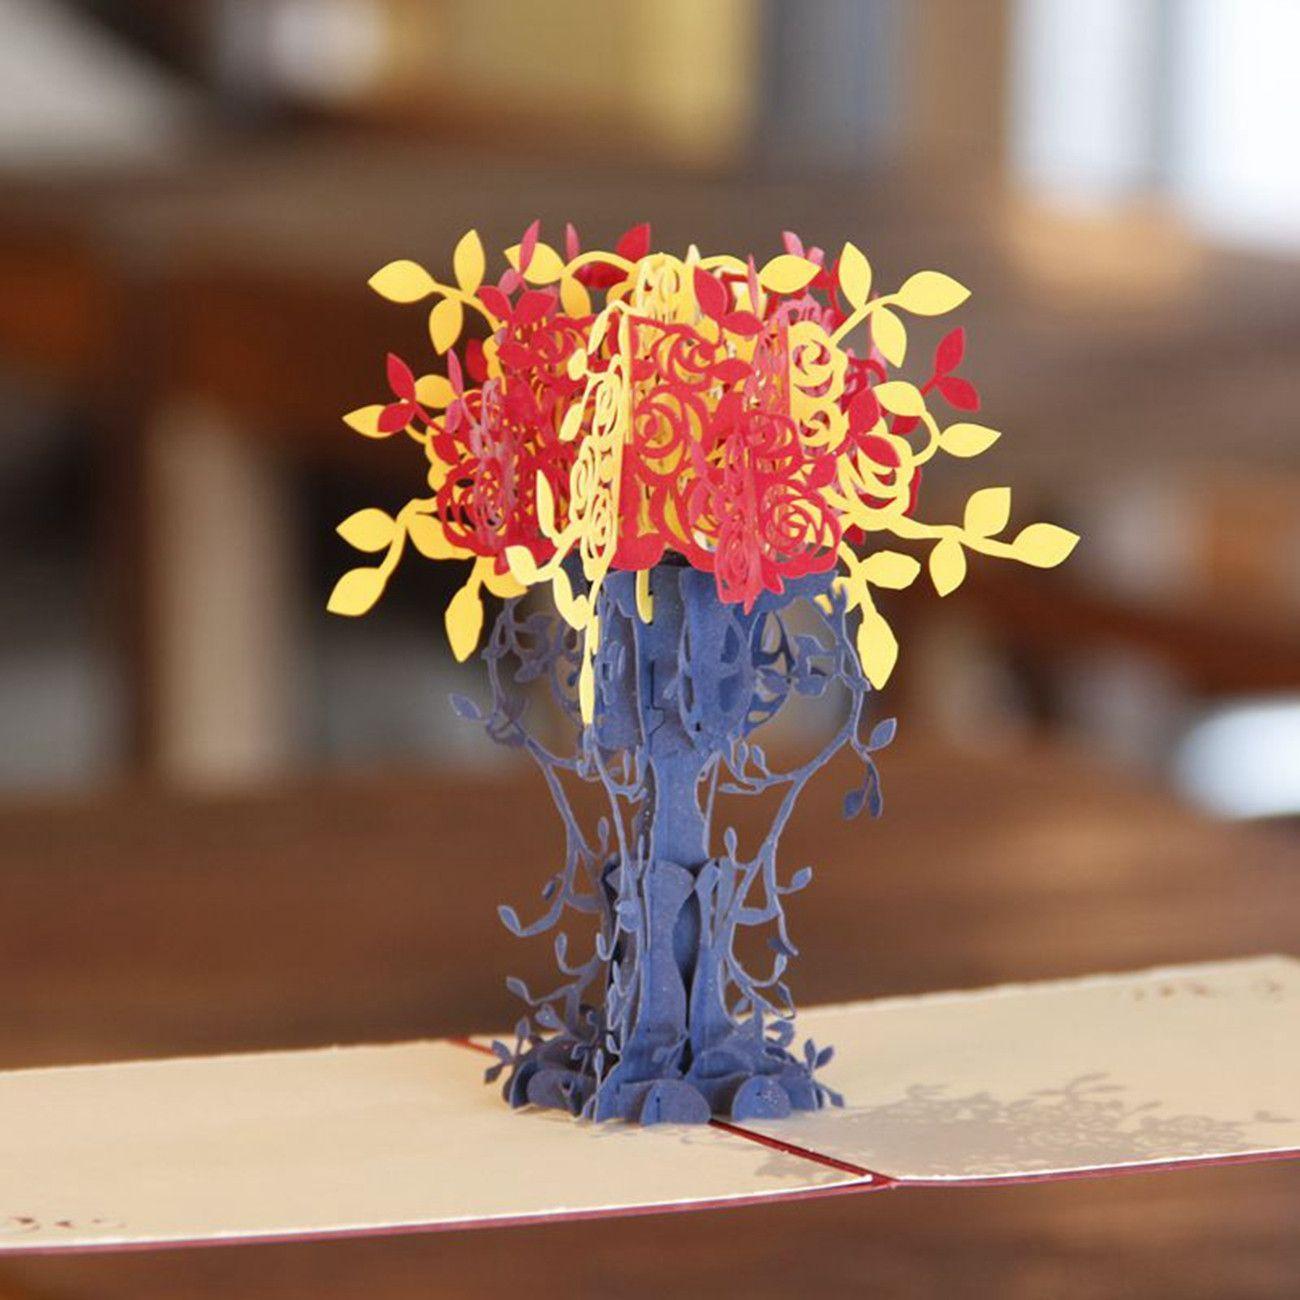 Flowerpot kirigami diy d pop up laser cut artesanato origami paper